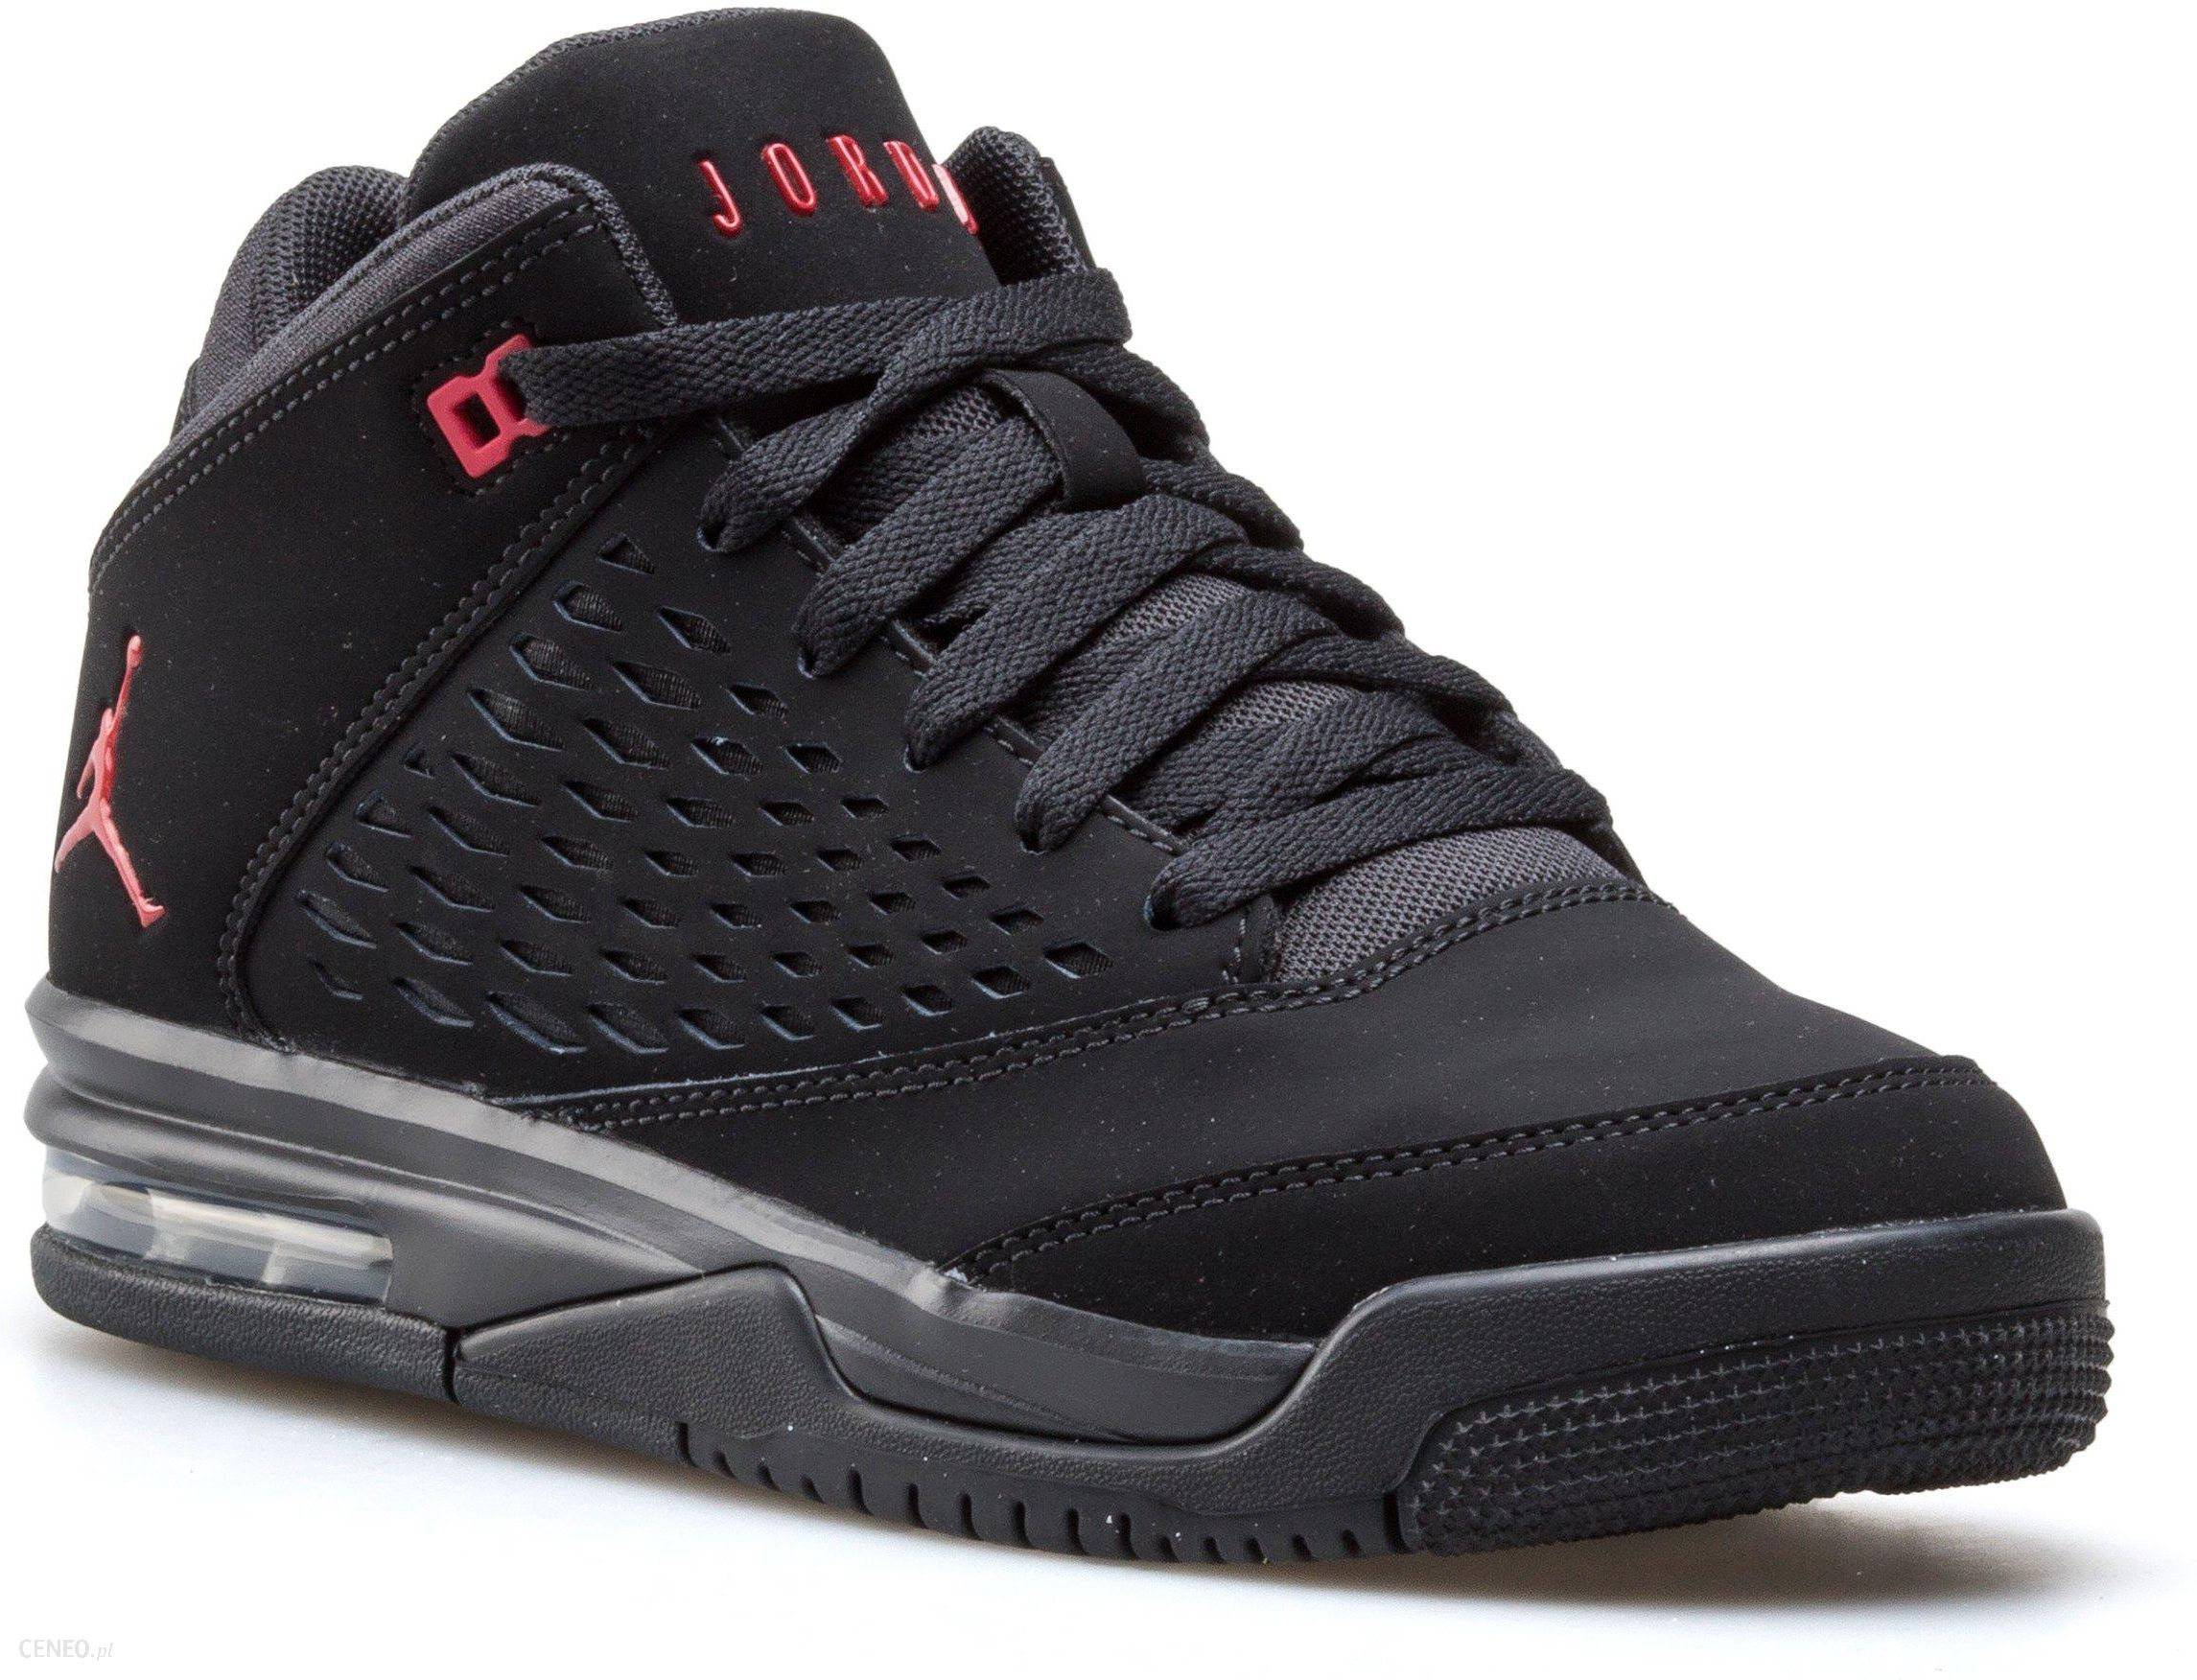 ADIDAS SWIFT RUN CQ2116 | kolor BIA?Y | M?skie Sneakersy | Buty w ? Sklep Sizeer ?